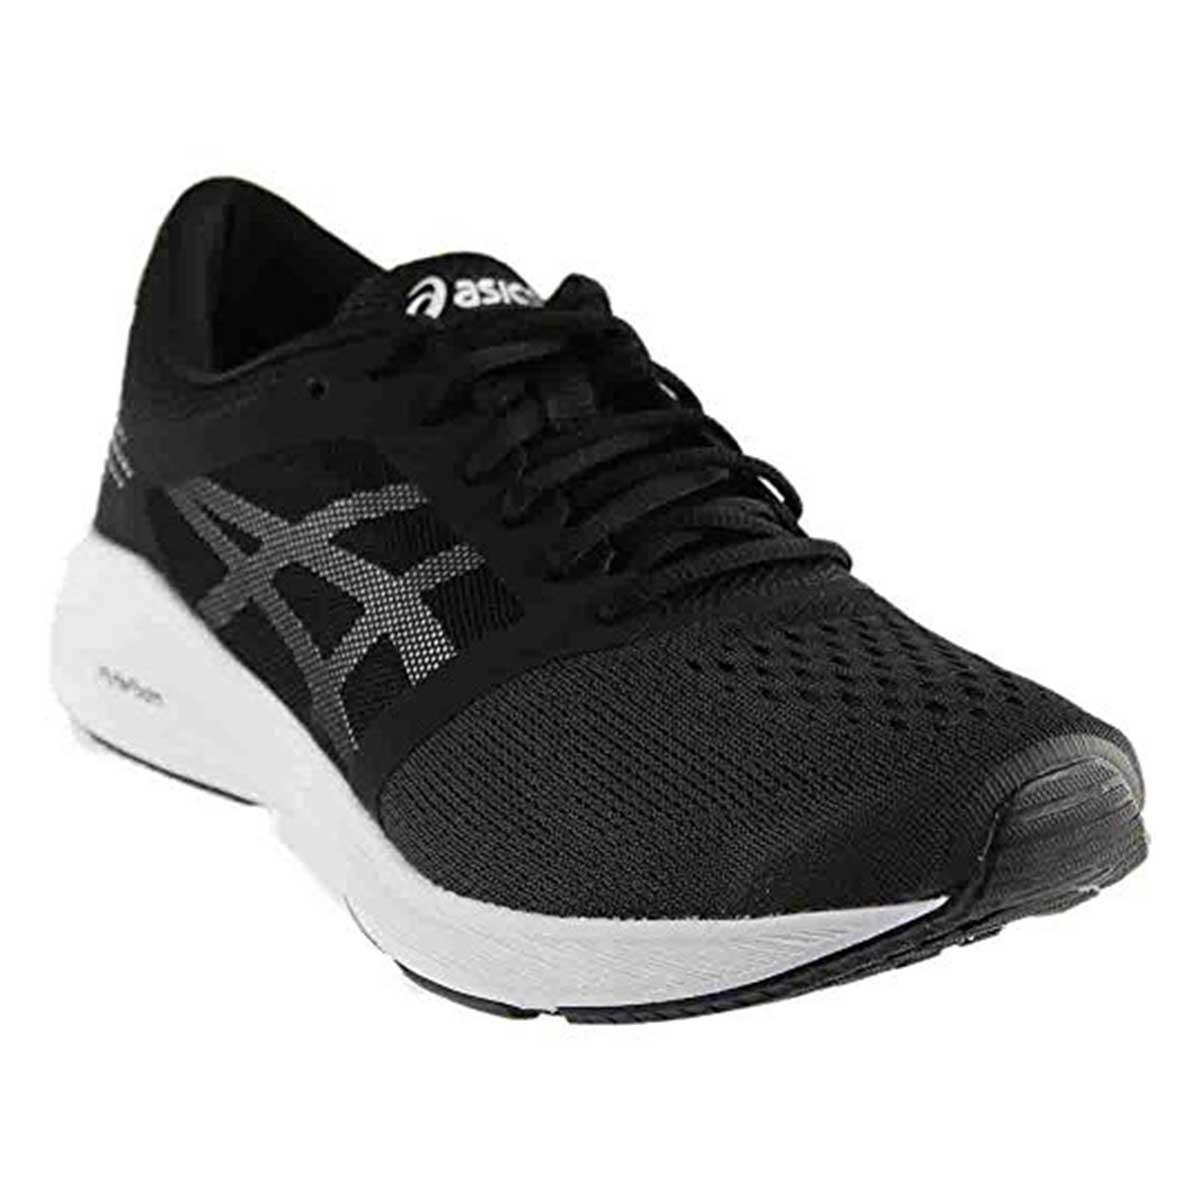 newest e3db8 13ad6 Asics Roadhawk FF Running Shoes (Black/White/Silver)